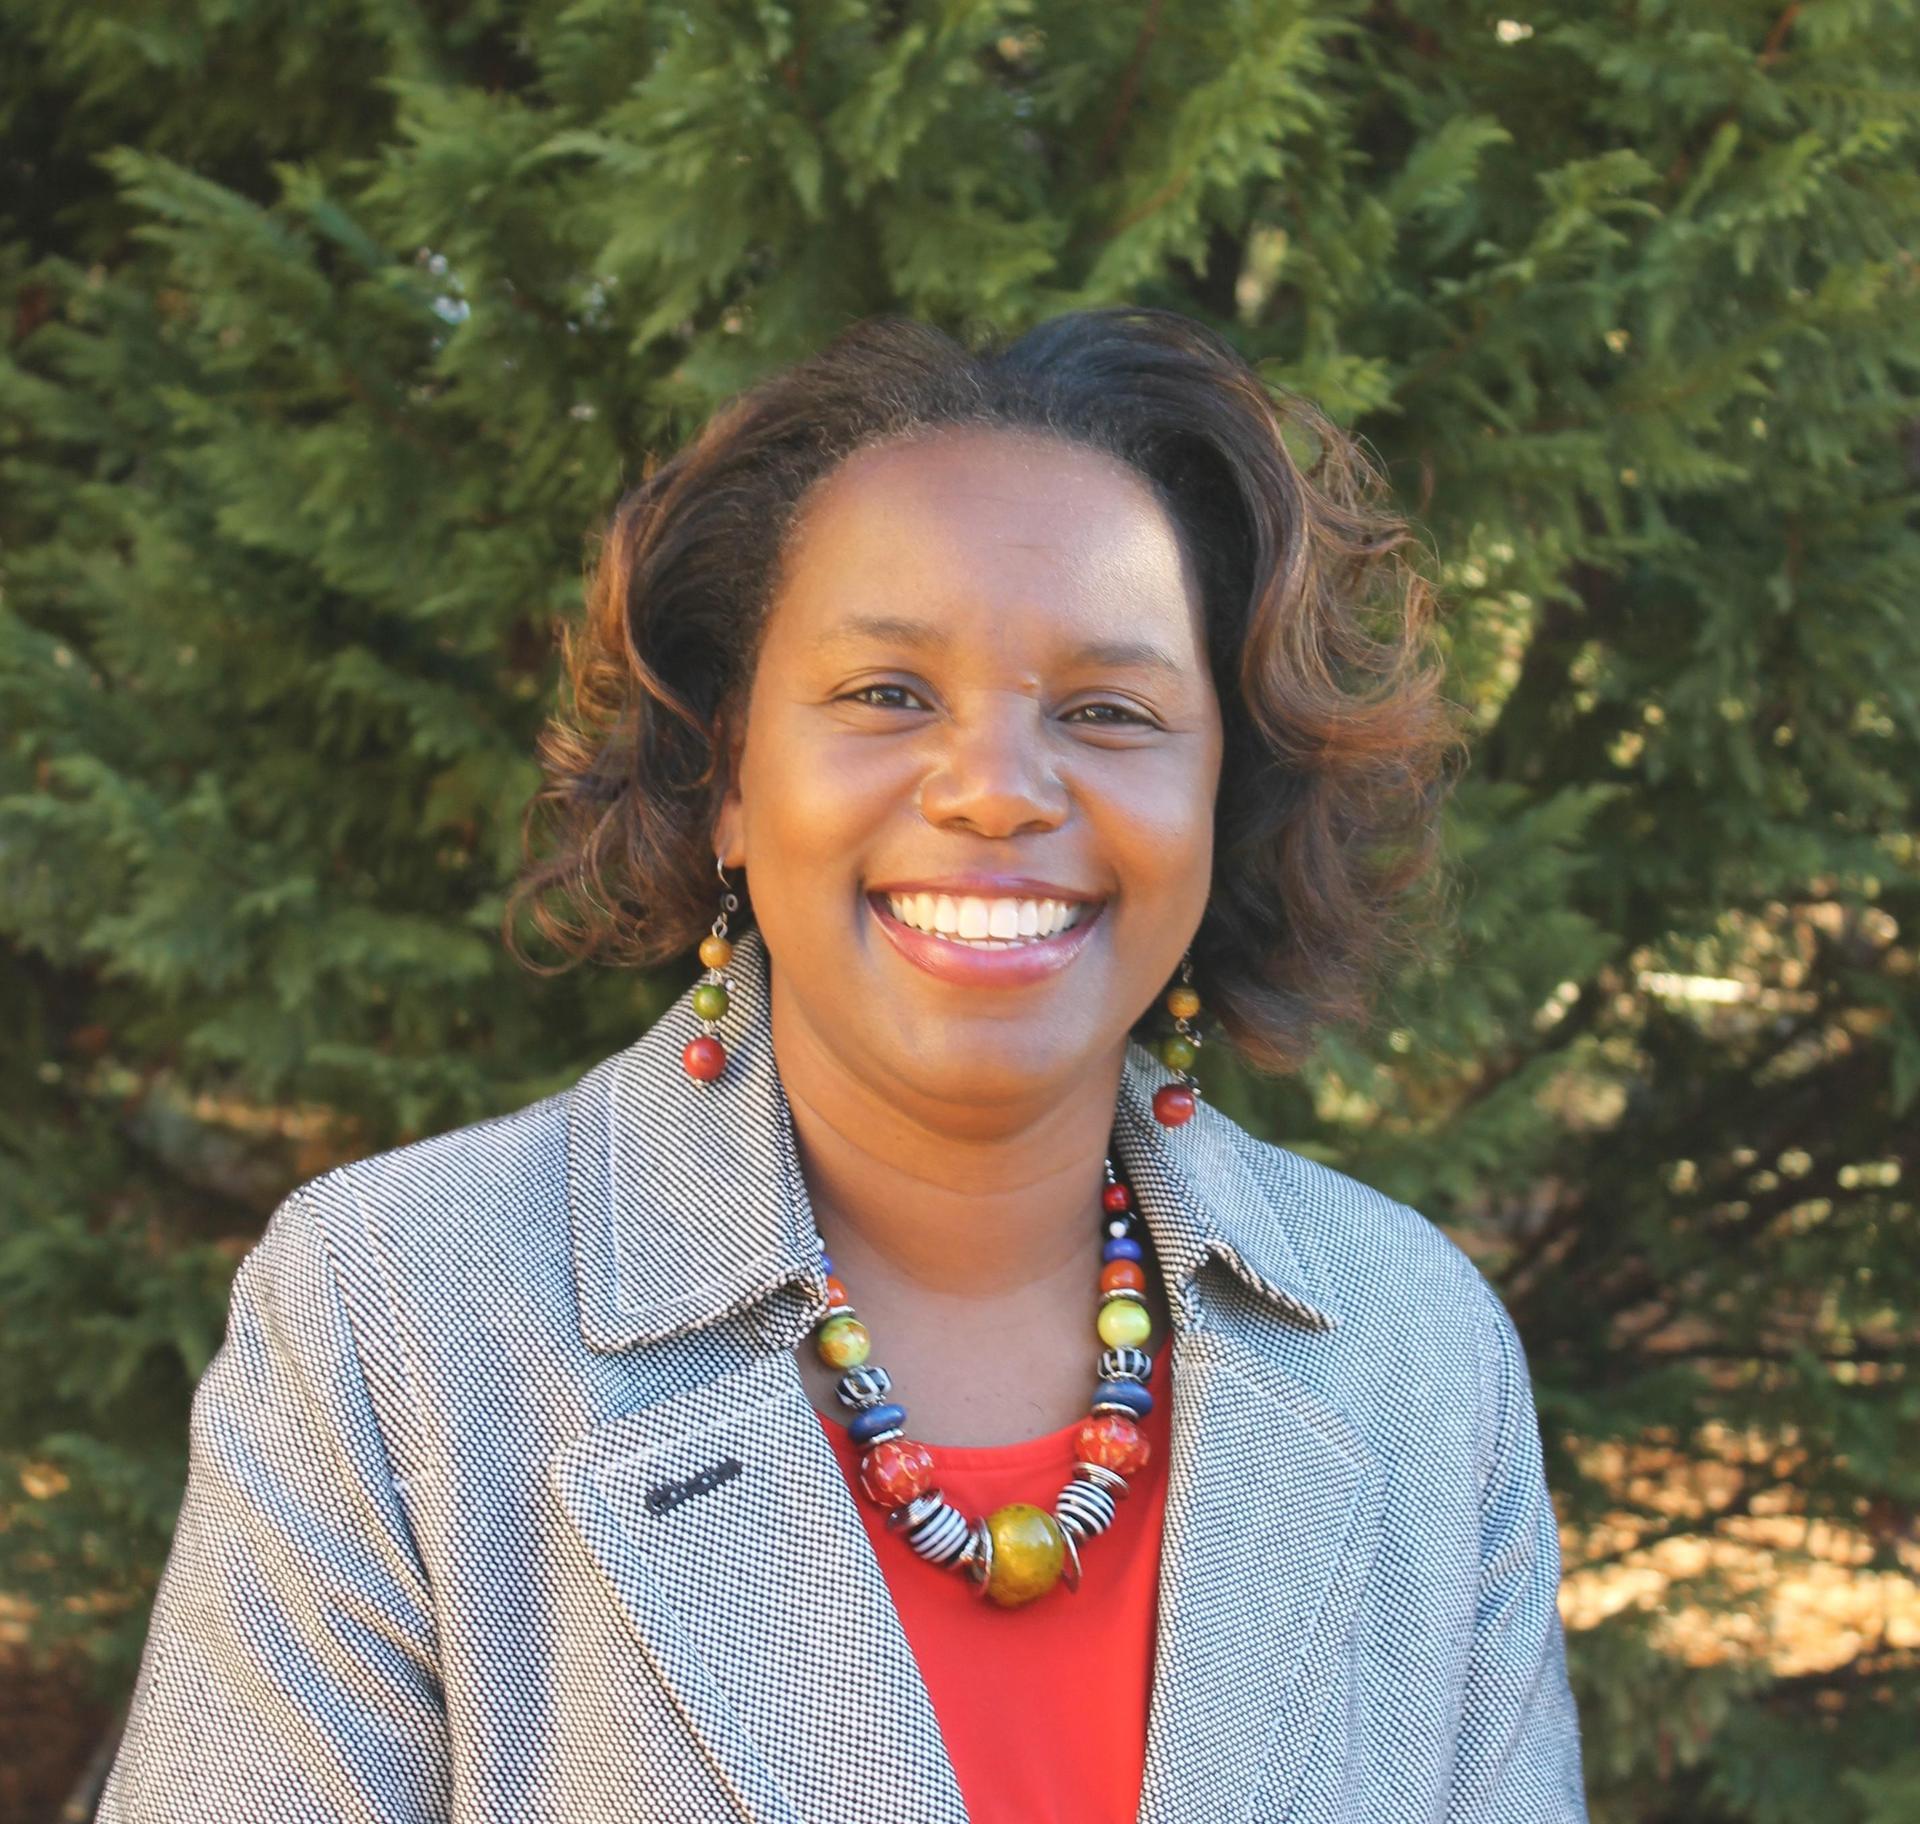 Headshot of Debra Tindall